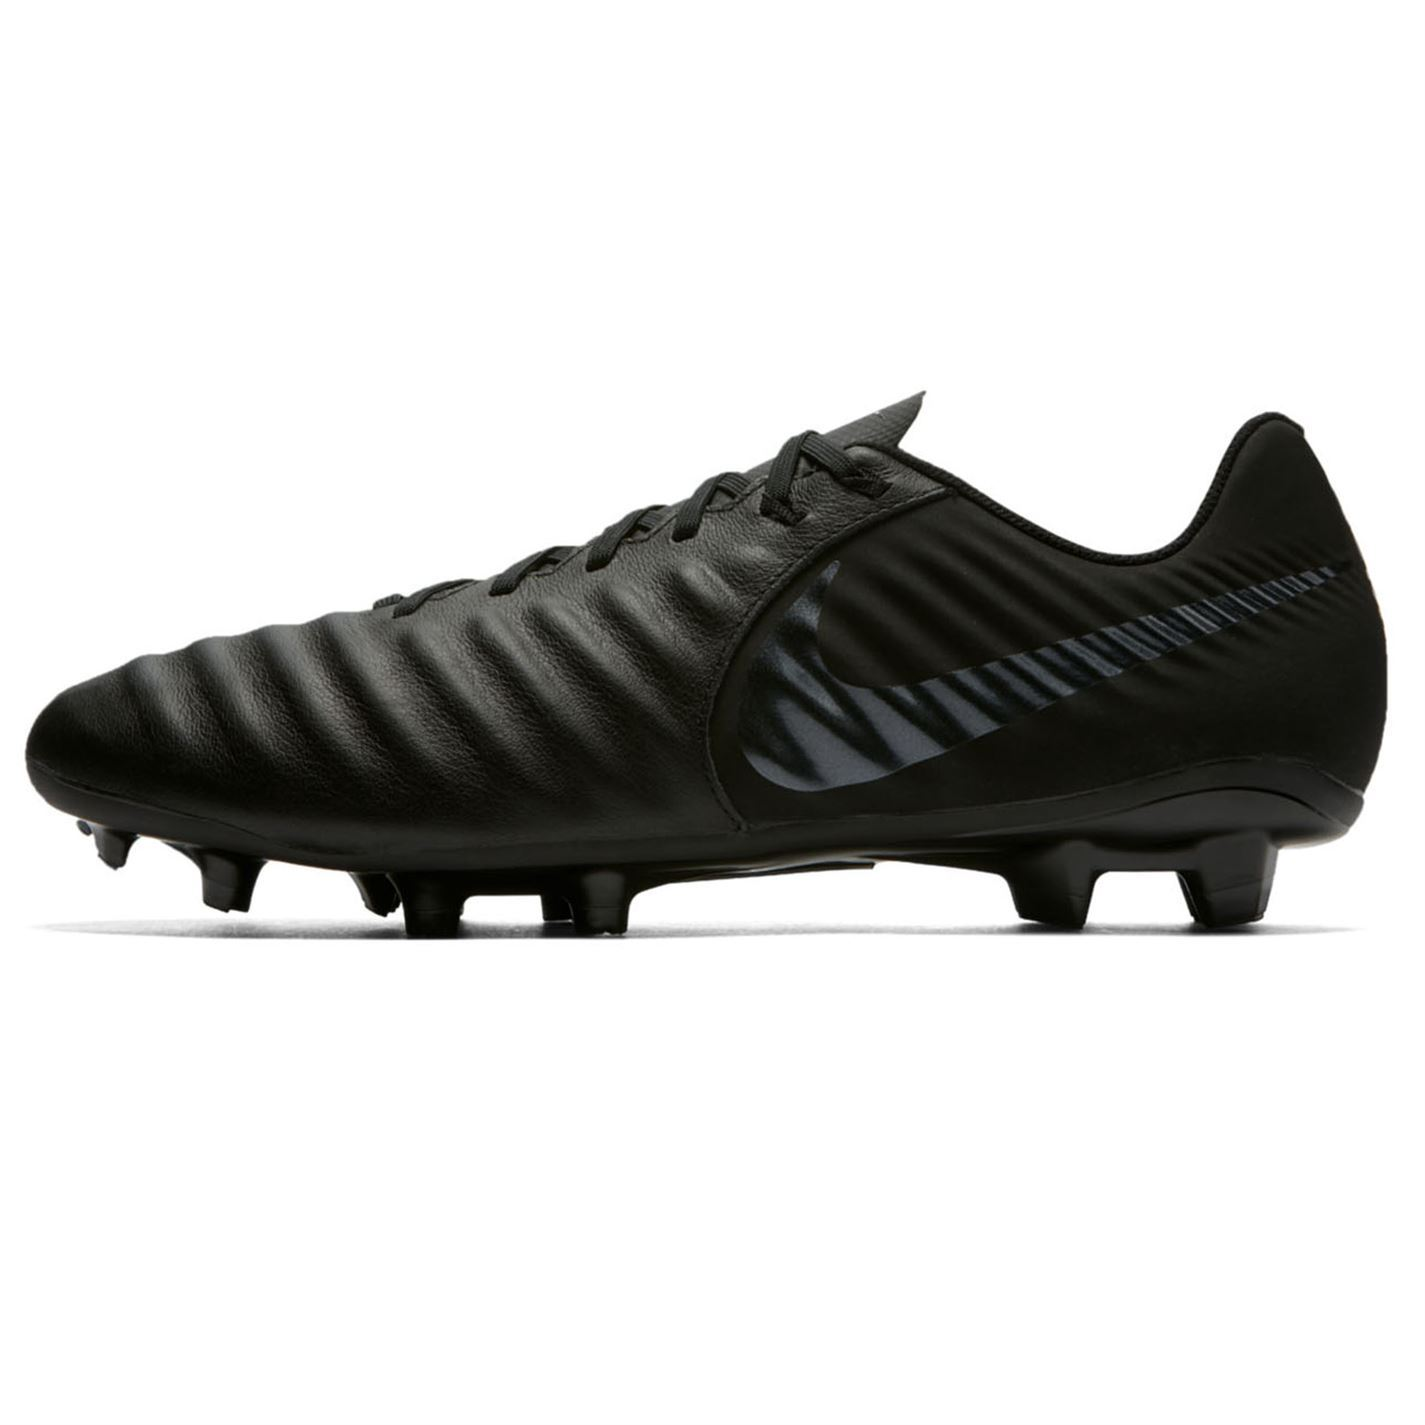 miniature 12 - Nike-Tiempo-Legend-Academy-FG-Firm-Ground-Chaussures-De-Football-Homme-Football-Chaussures-Crampons